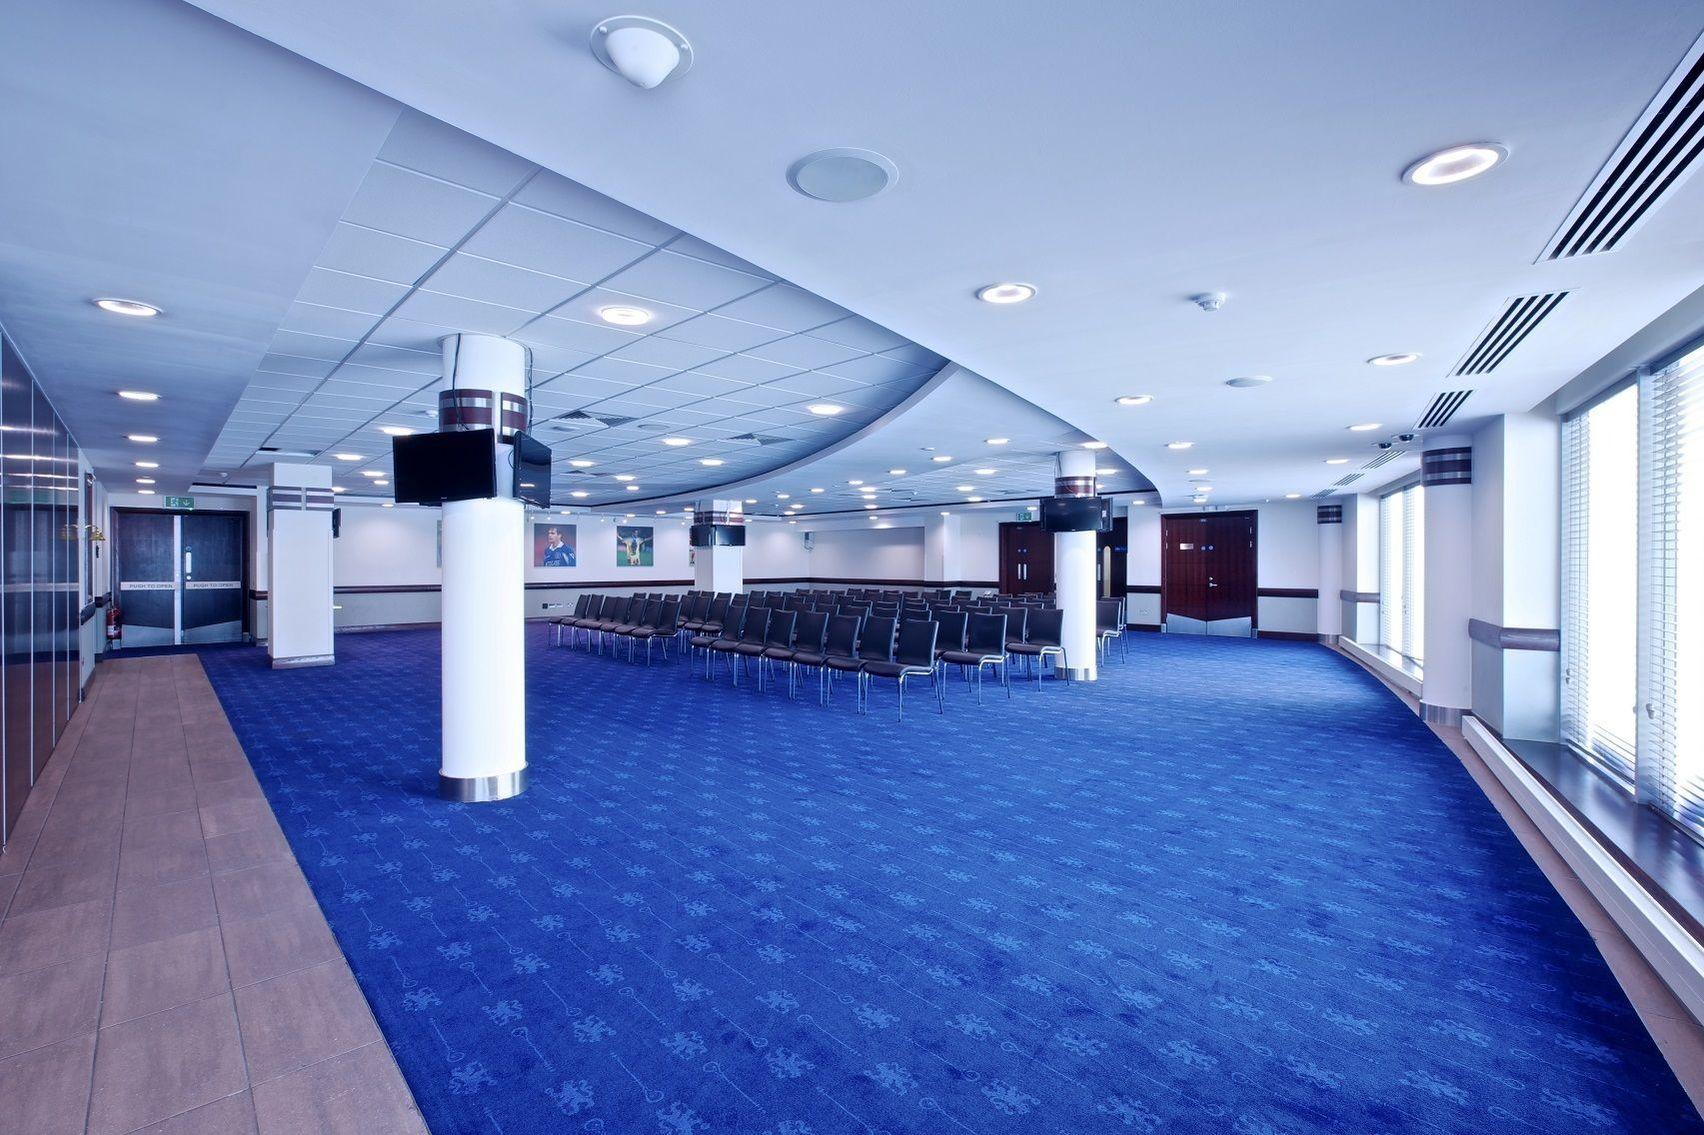 Bonetti Suite, Chelsea Football Club